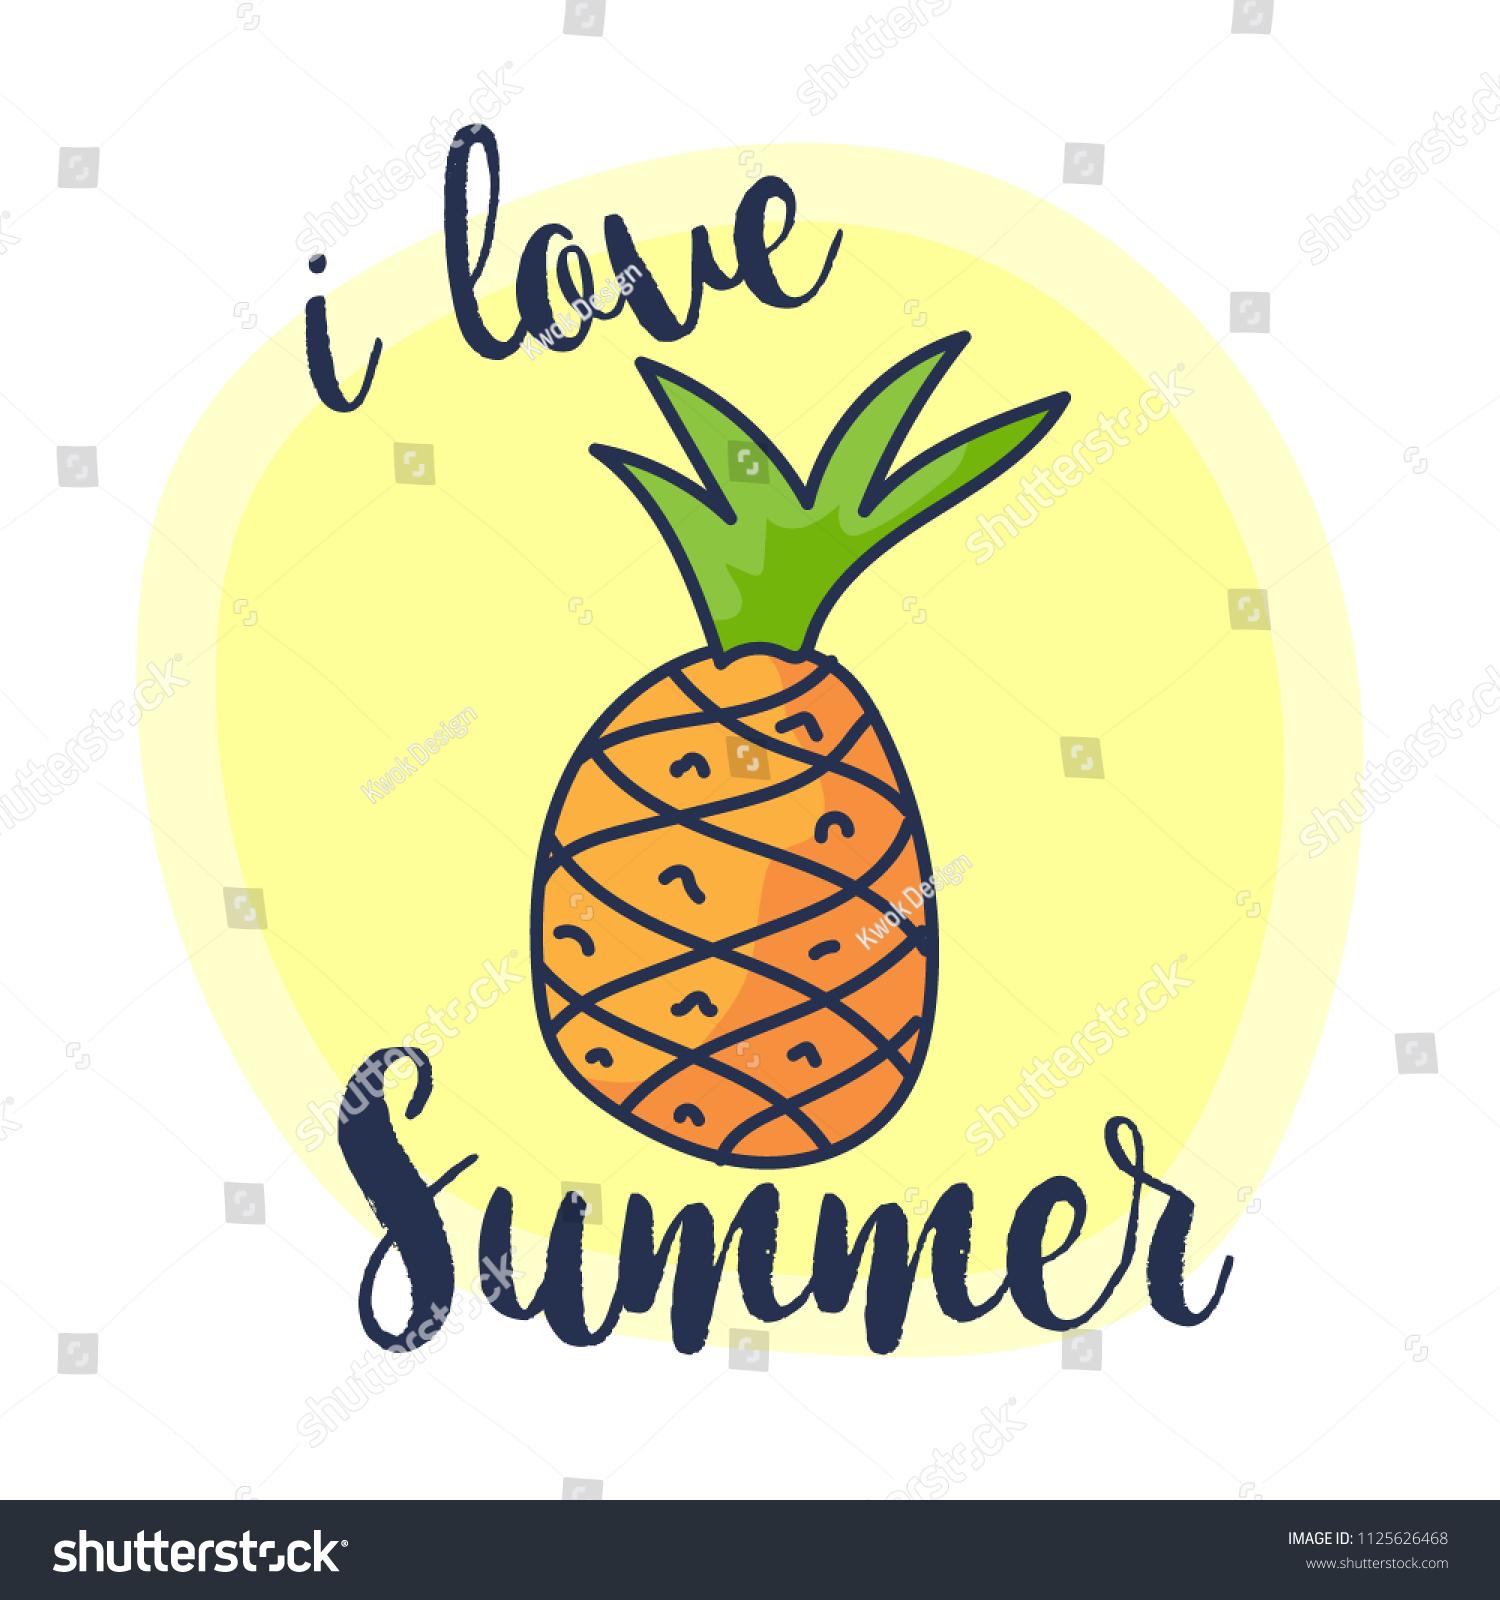 Cute Pineapple Drawings Www Topsimages Com